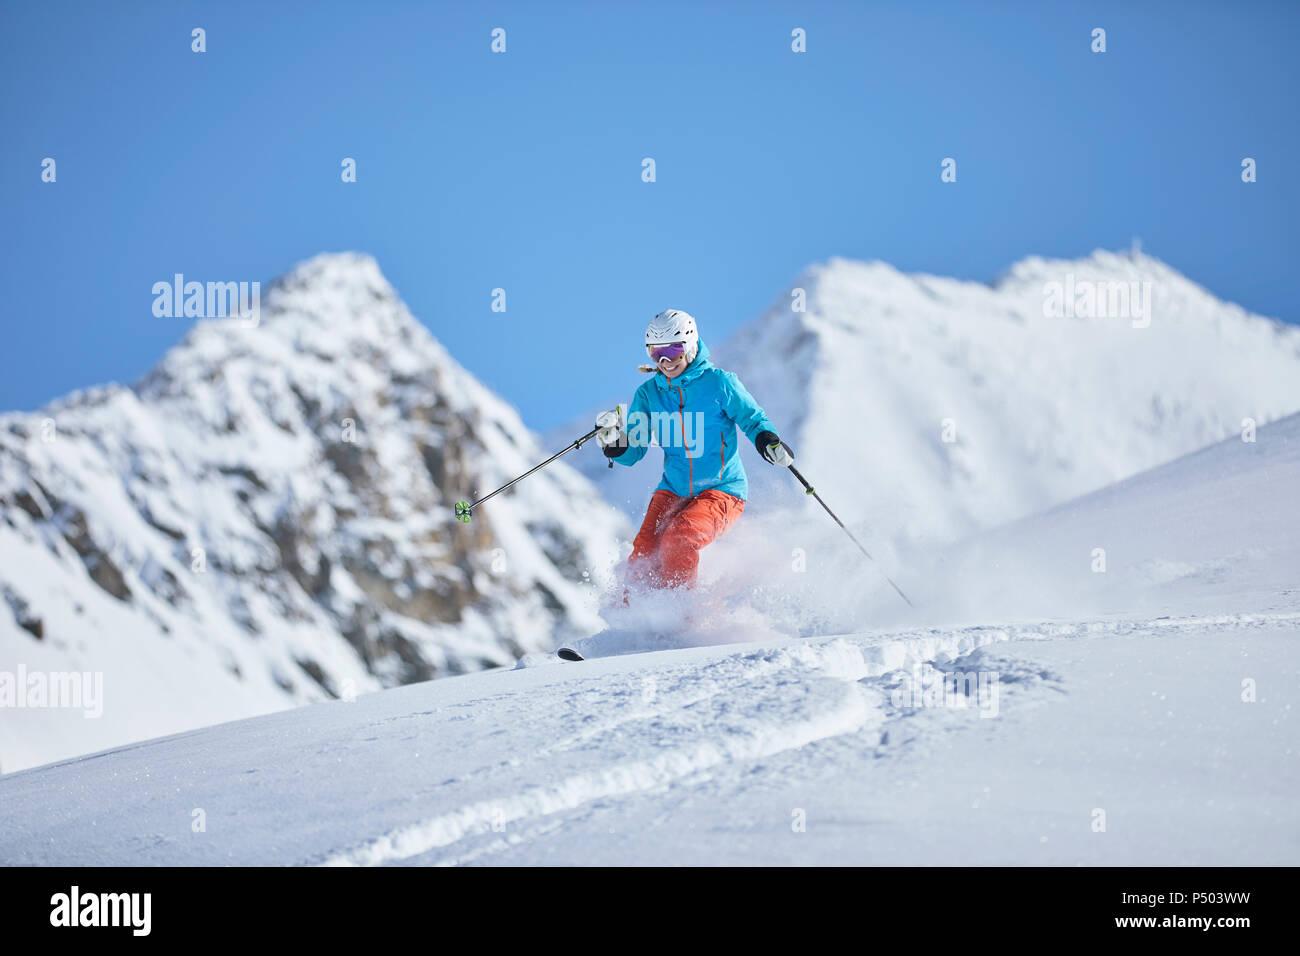 Austria, Tyrol, Kuehtai, woman skiing in winter landscape - Stock Image